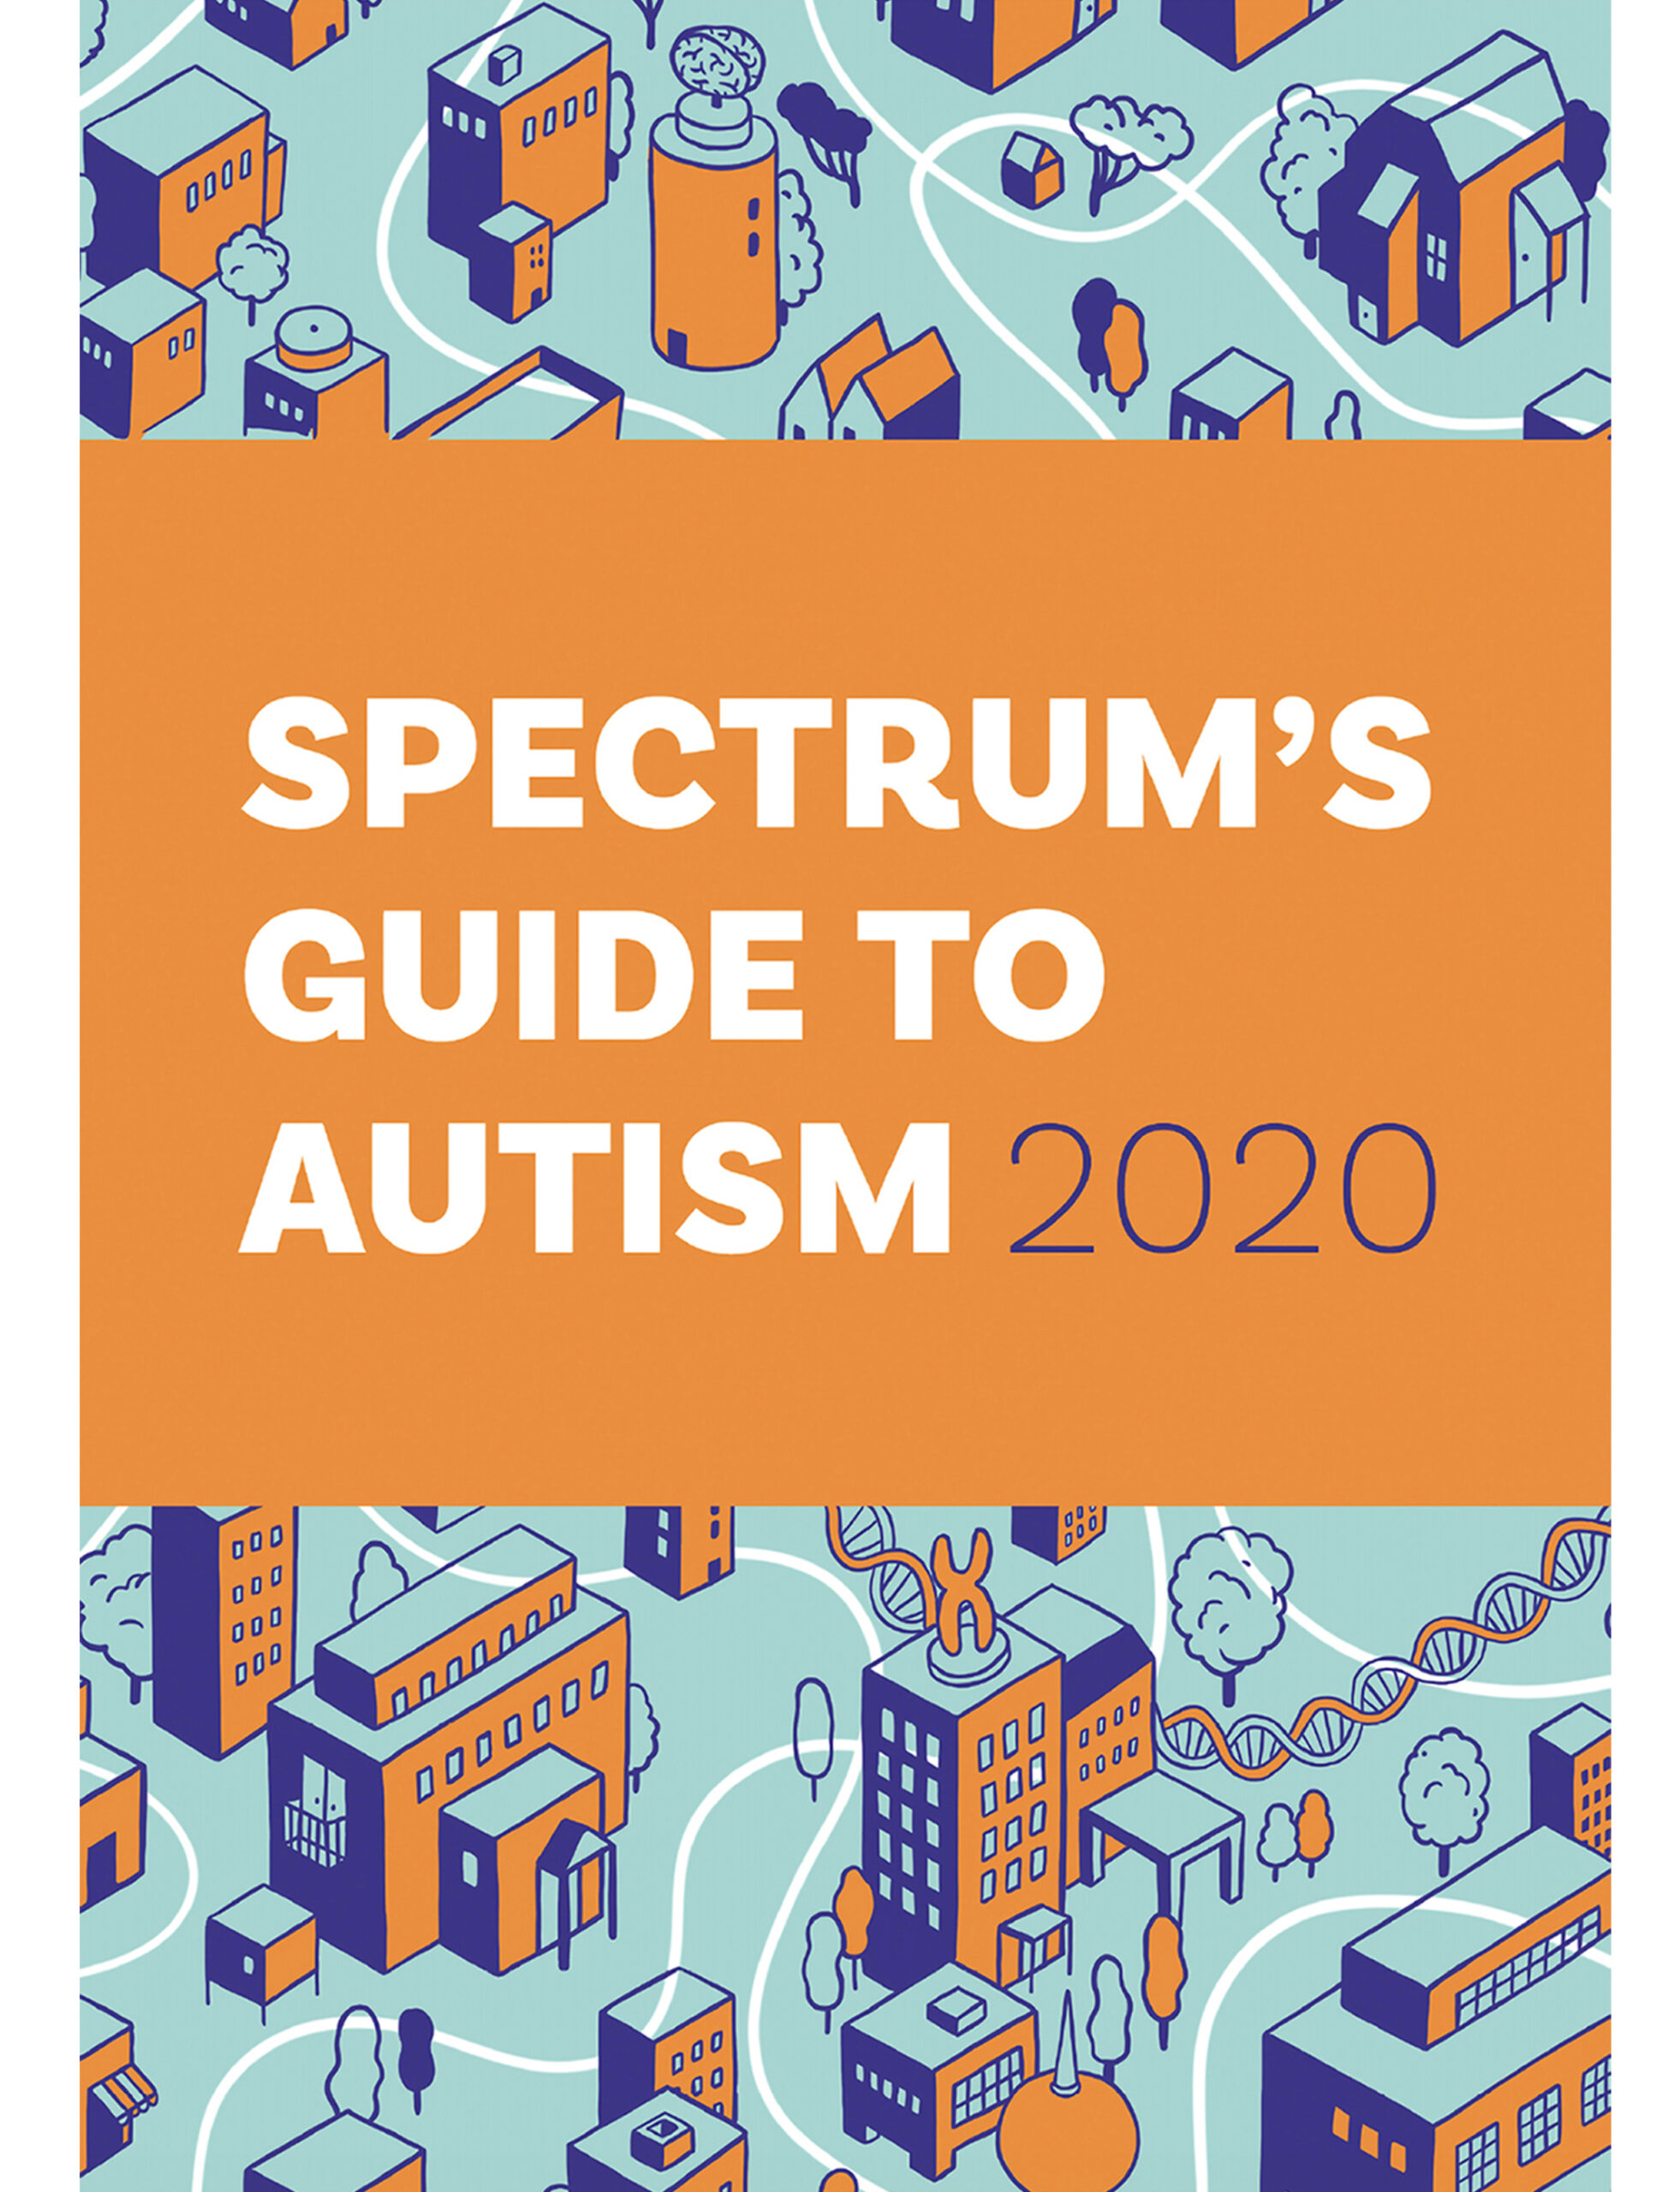 Spectrum's guide to autism 2020